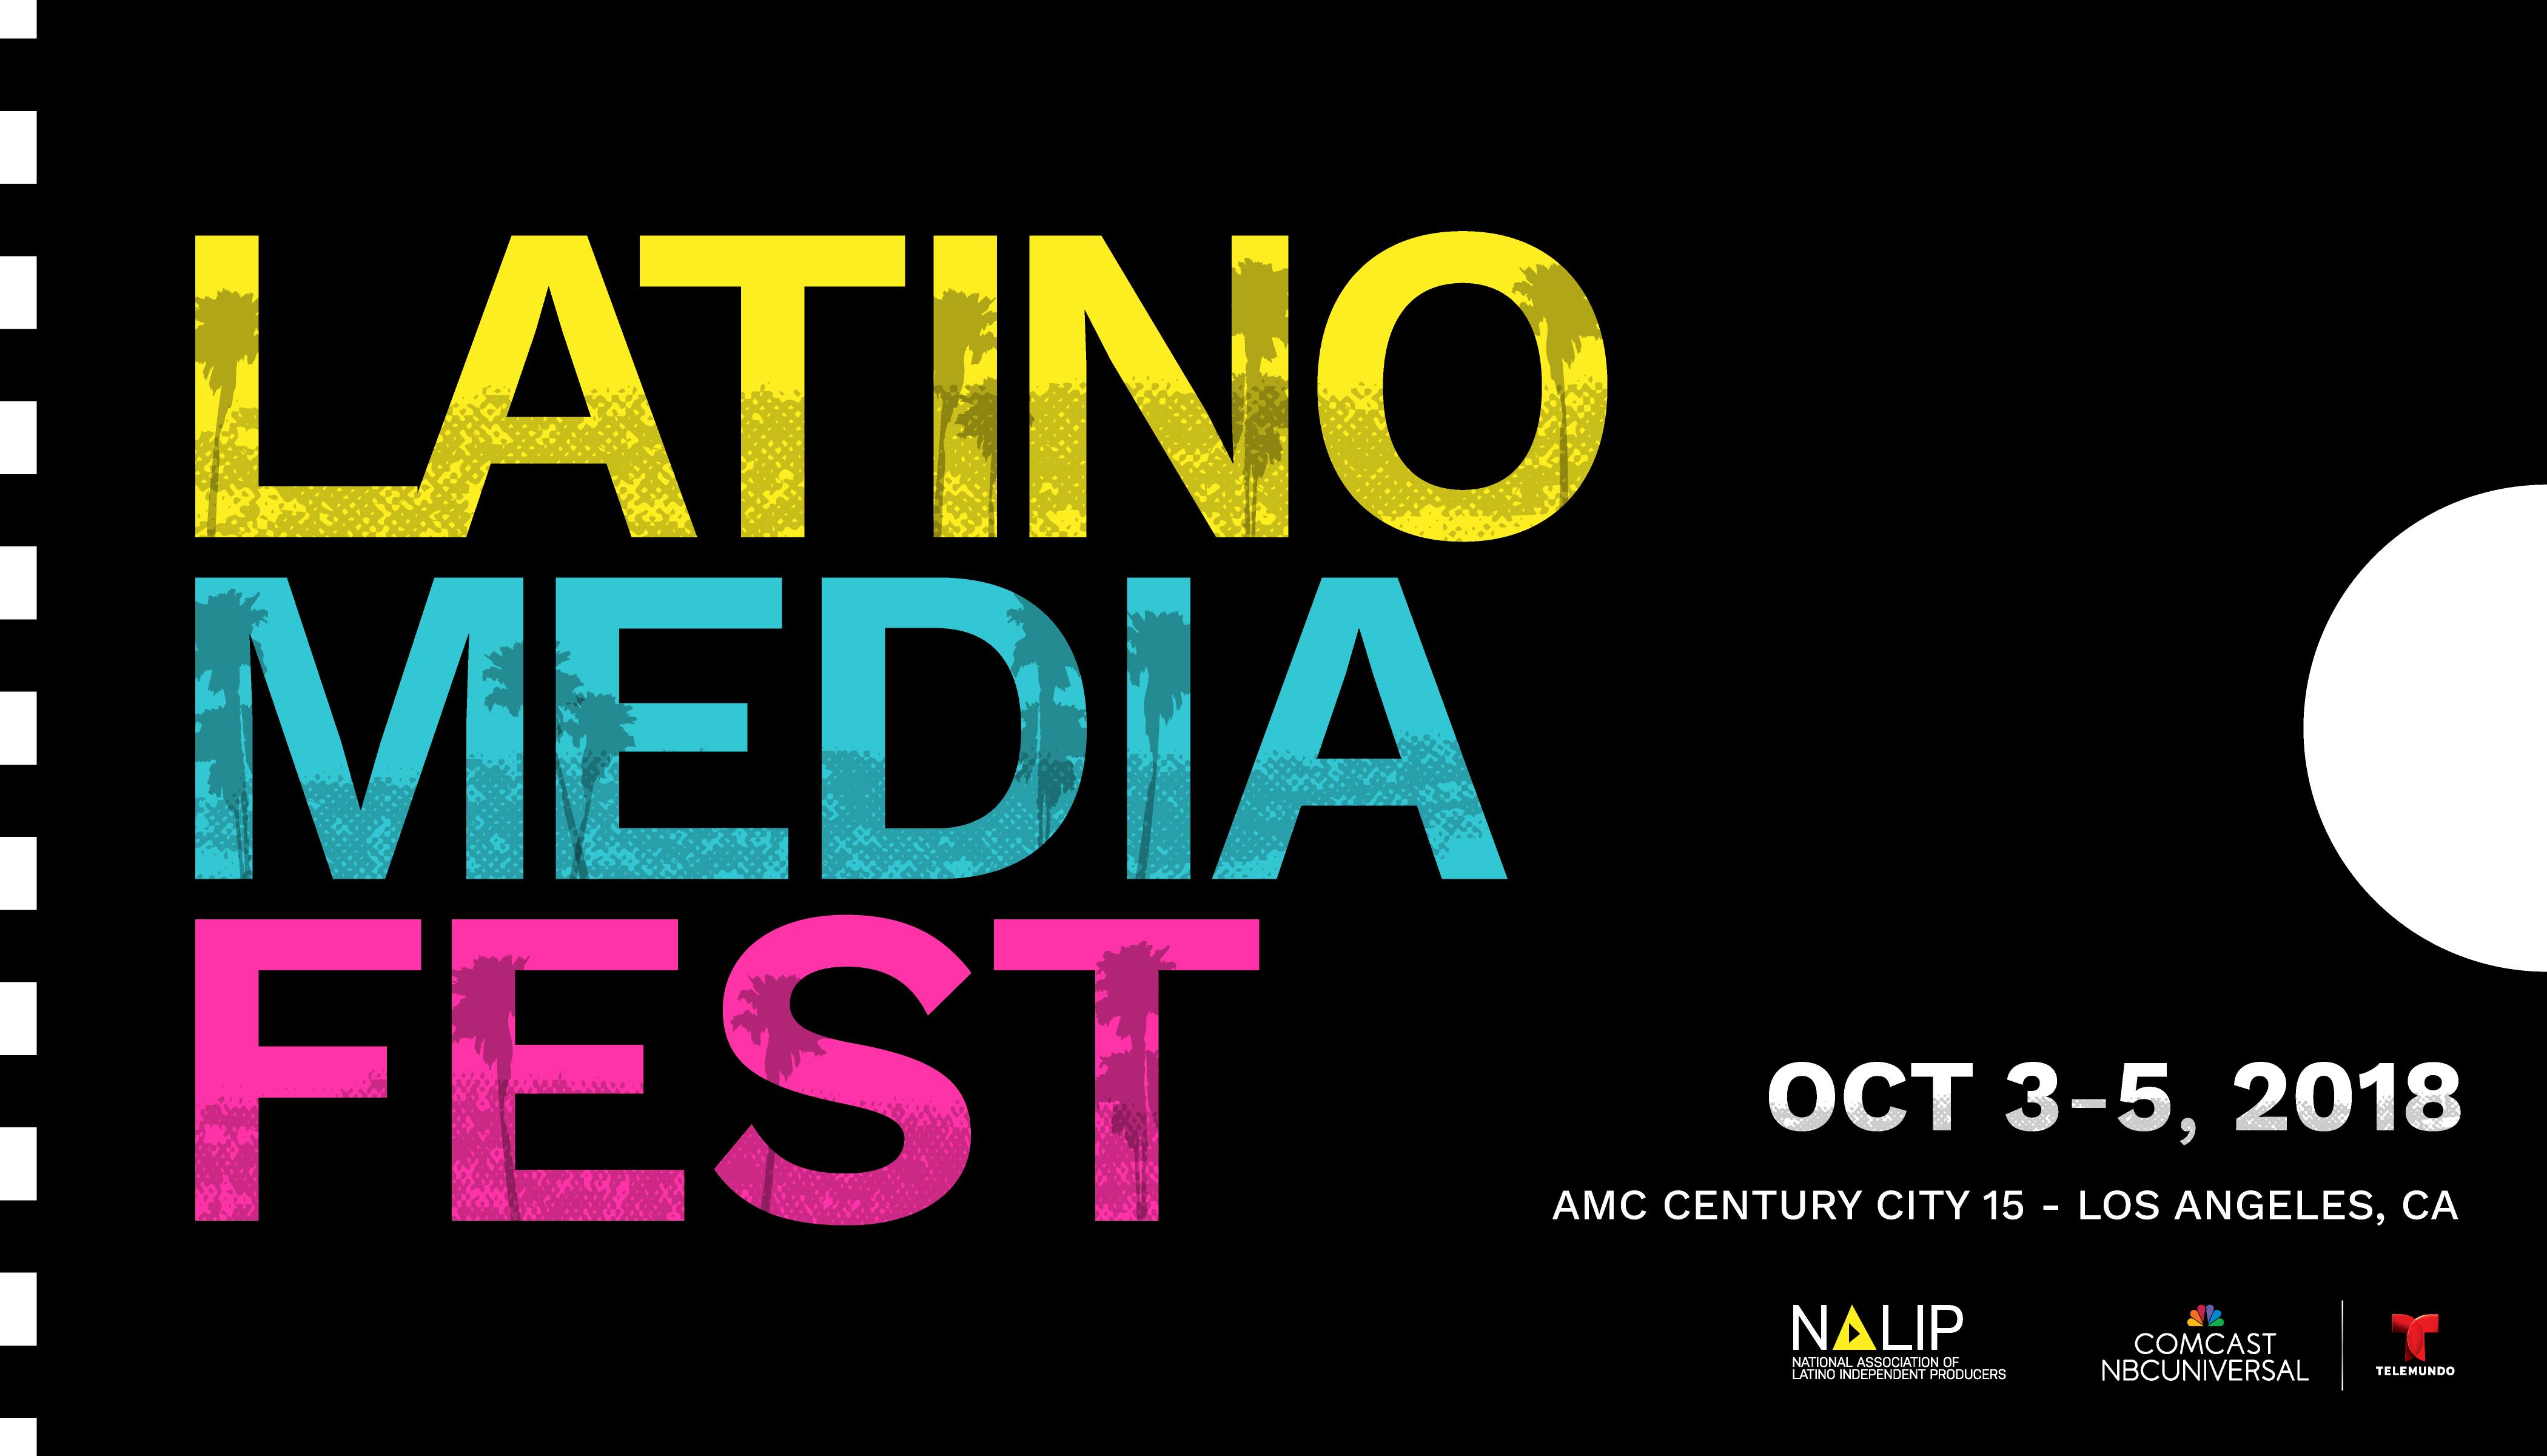 Latino Media Fest Oct 3-5, 2018 AMC Century City 15 - Los Angeles, CA